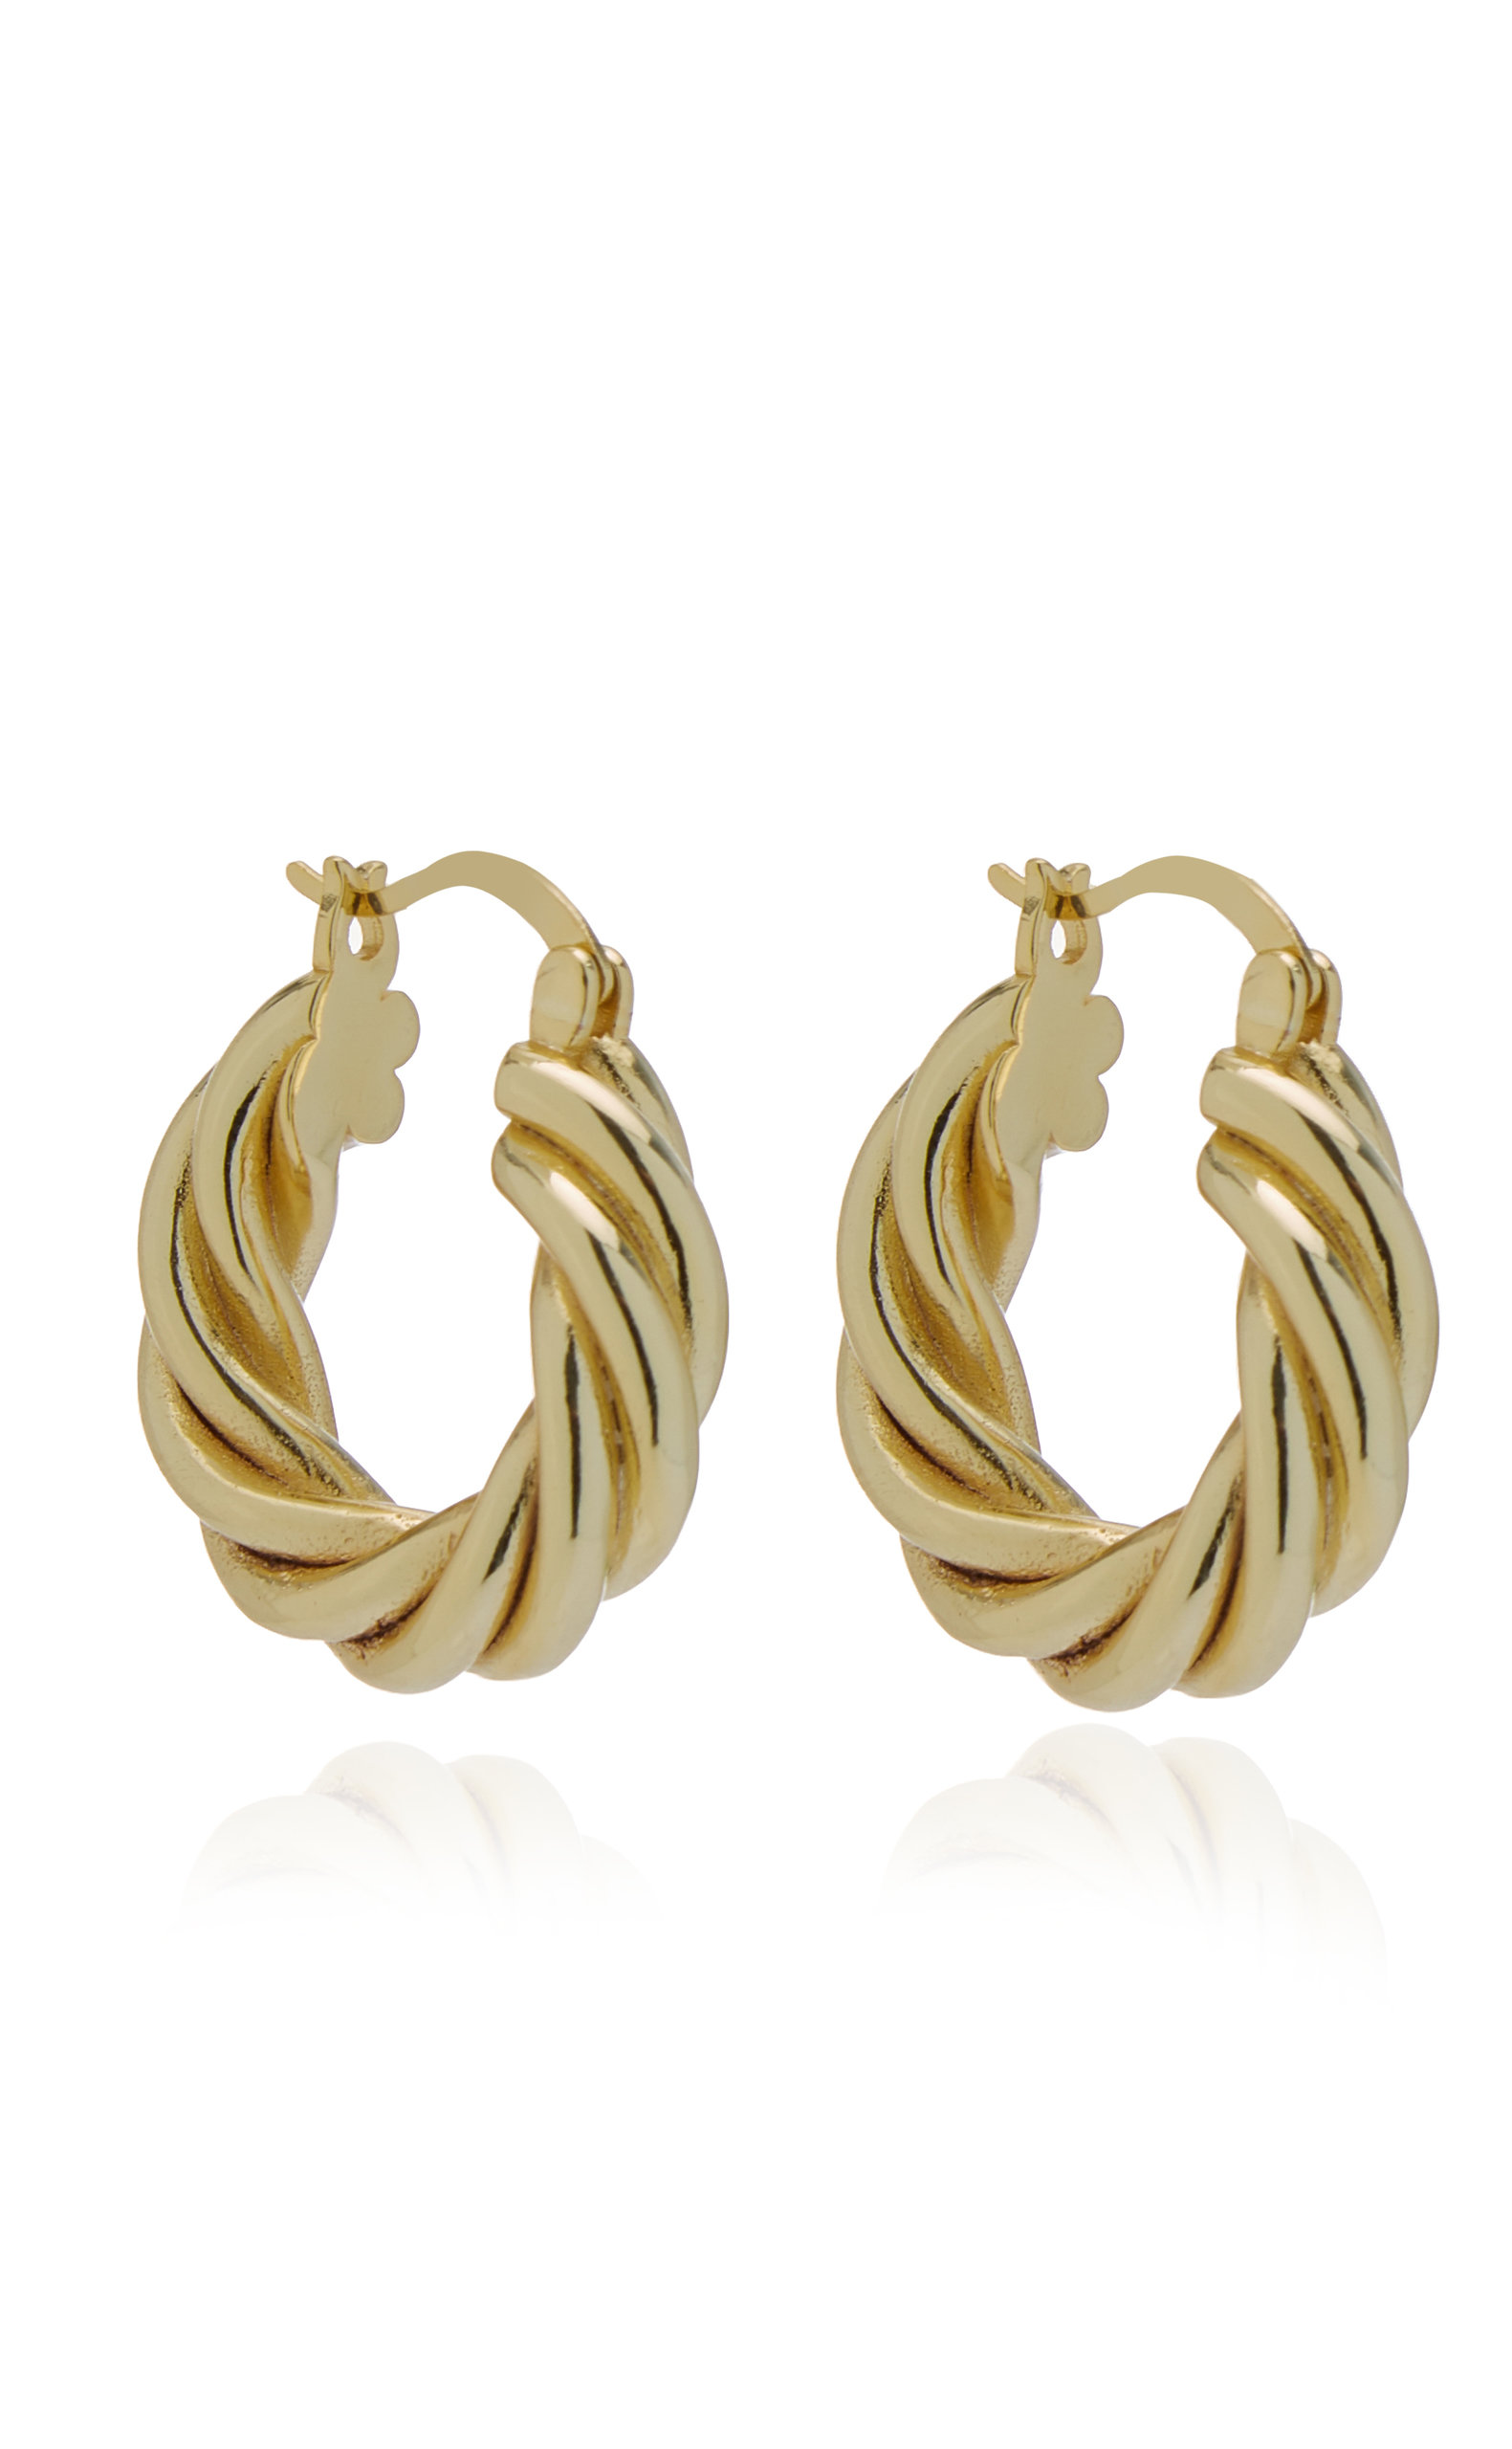 Emili - Women's Diane 14k Gold-Plated Hoop Earrings - Gold - Moda Operandi